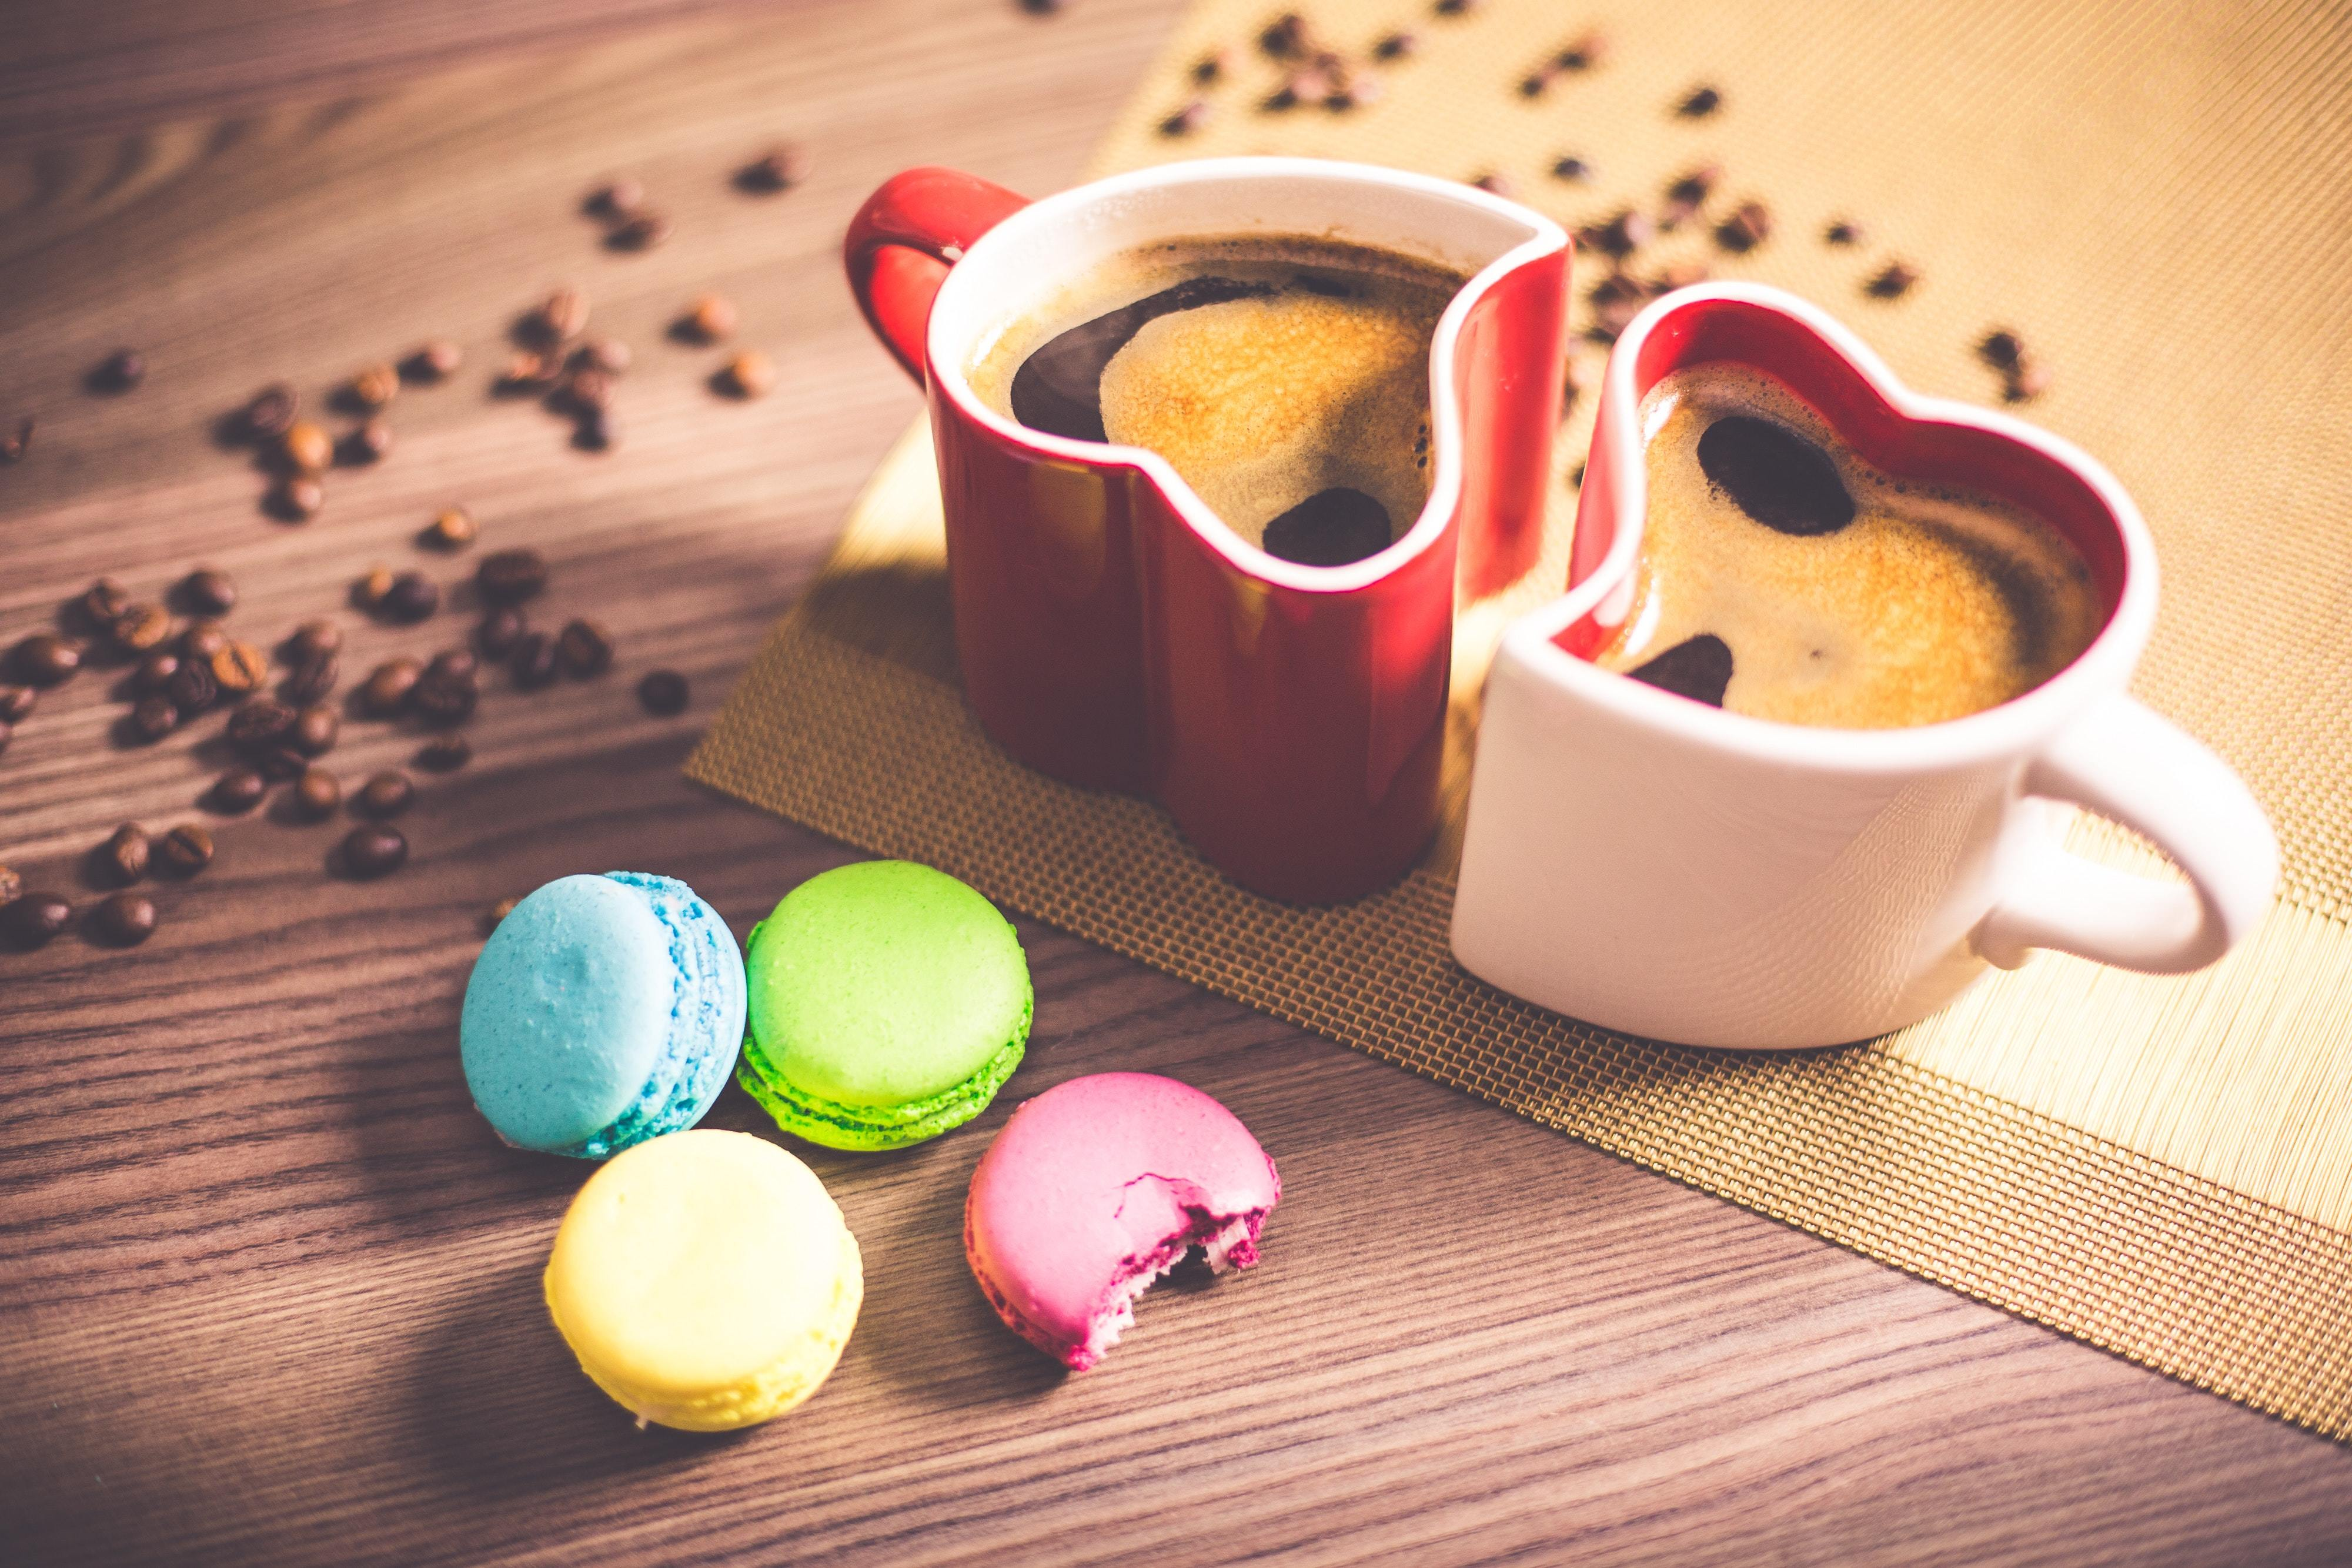 Картинка: Кружки, две, пара, кофе, форма, сердечки, зёрна, сладости